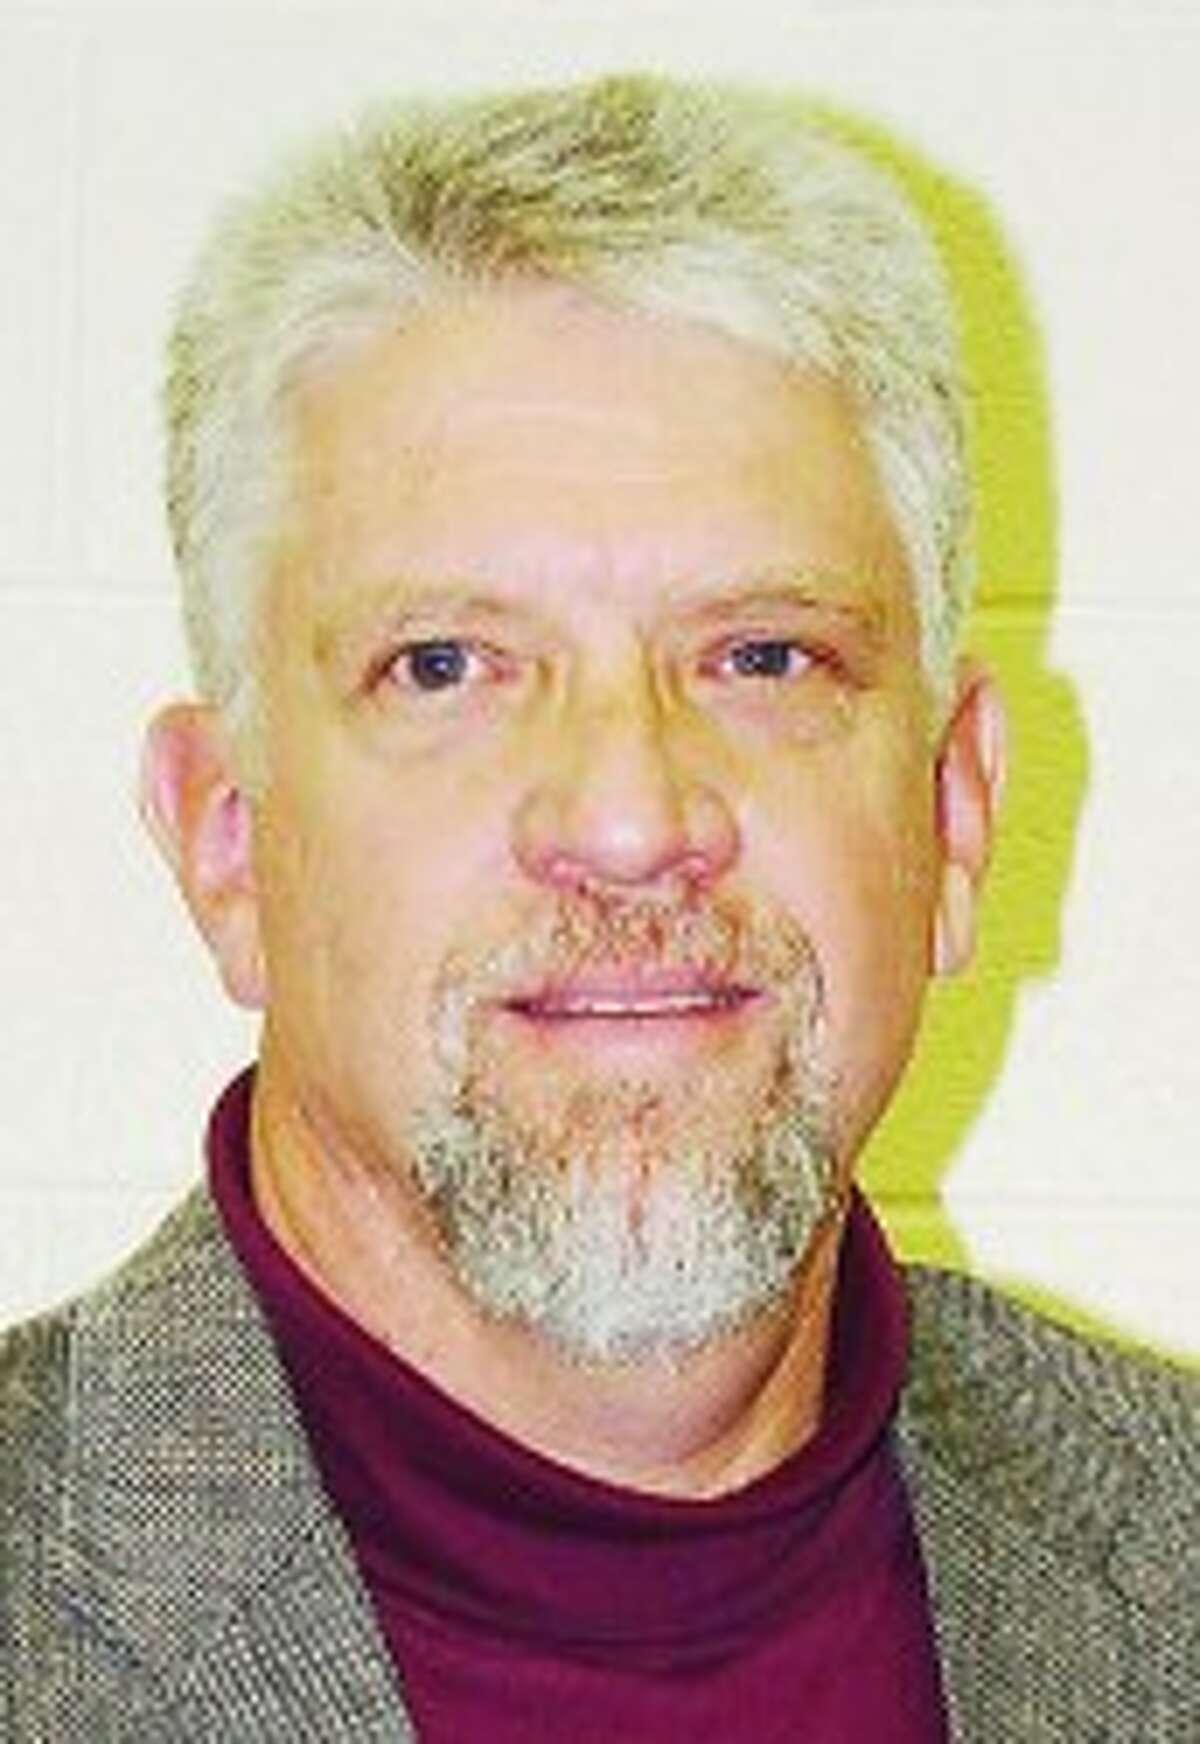 Mecosta County Administrator Paul Bullock